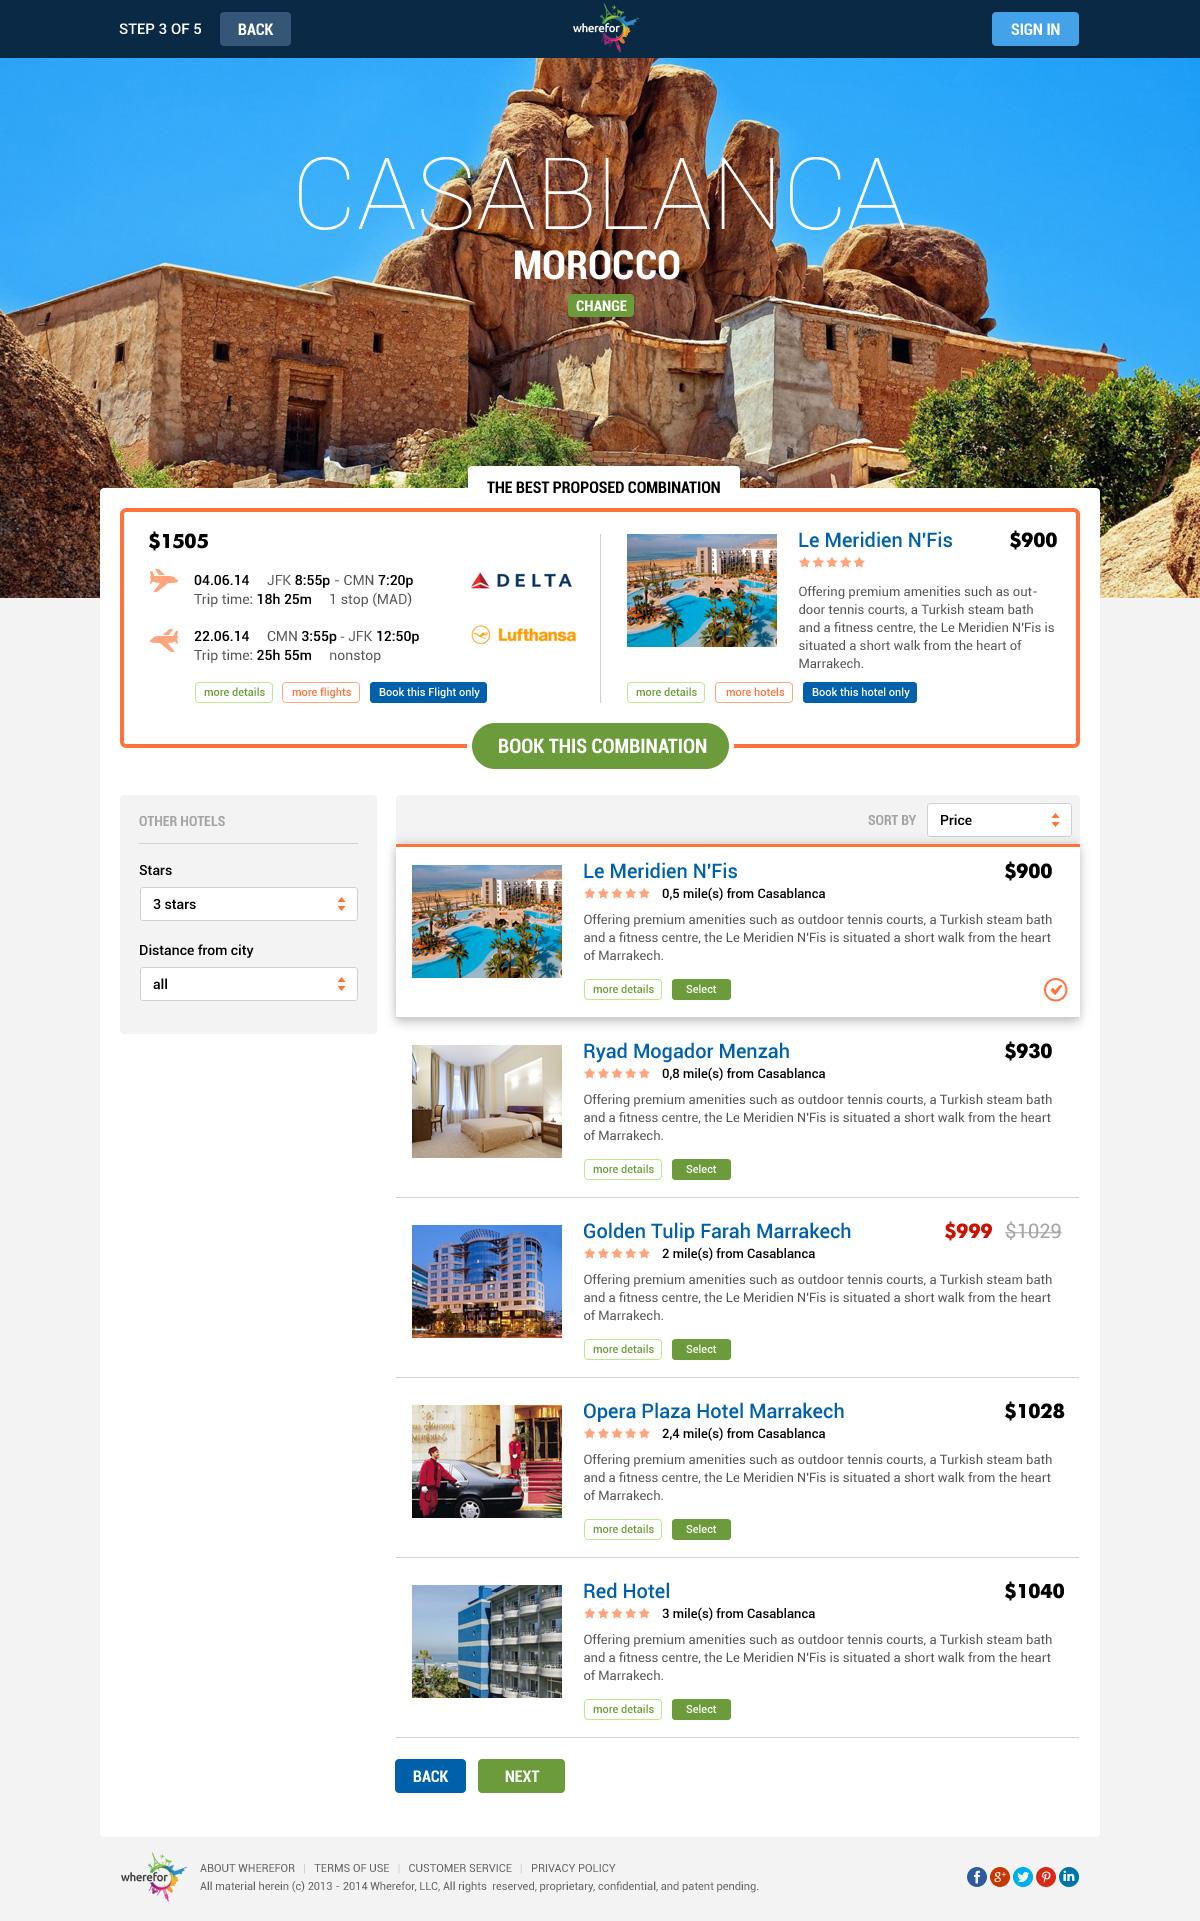 WhereFor -  поисковик авиабилетов и отелей